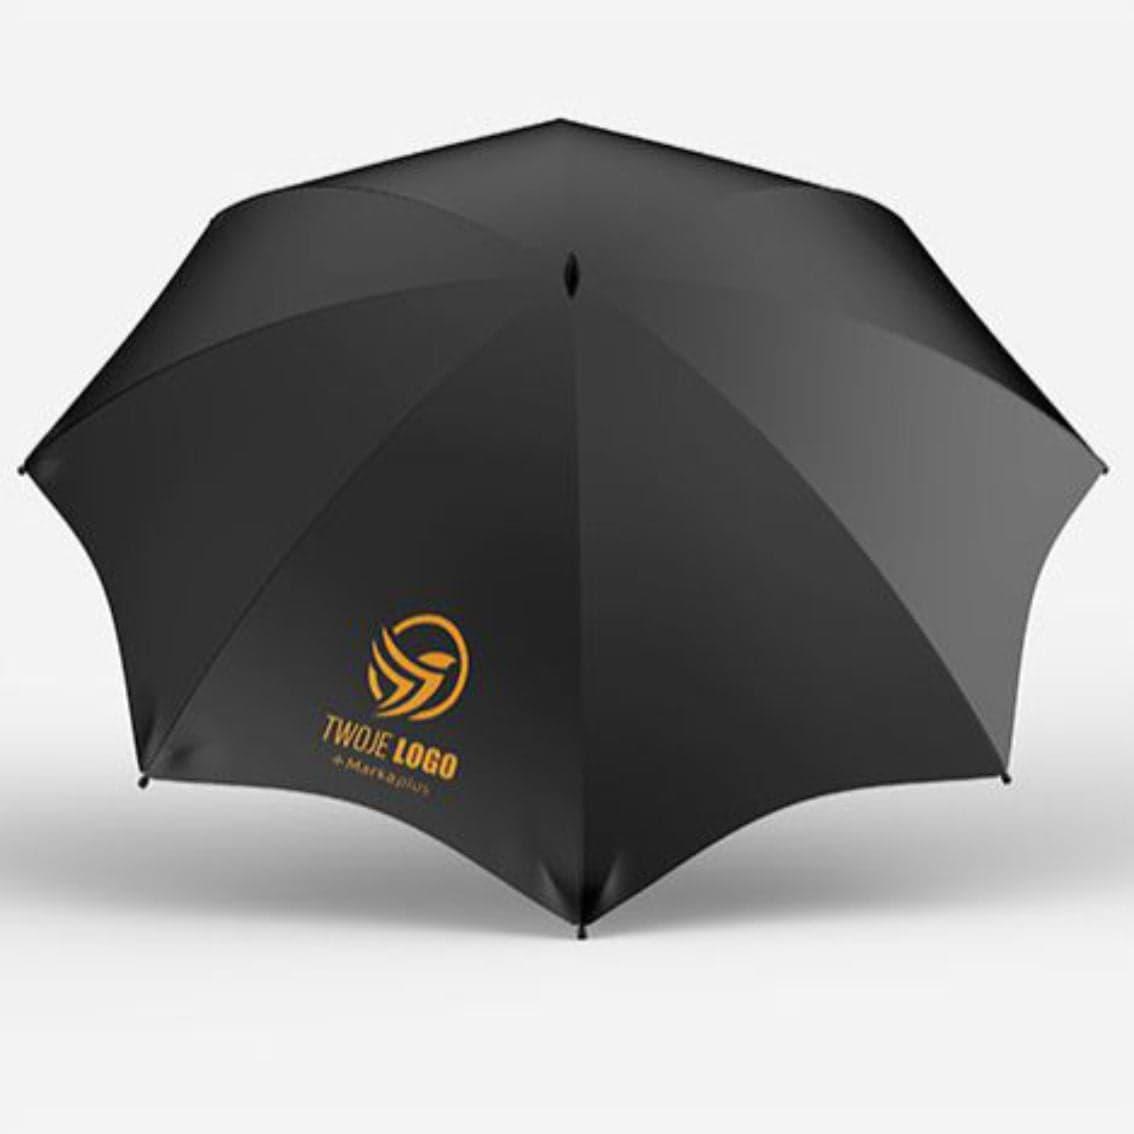 parasol reklamowy z Twoim logo